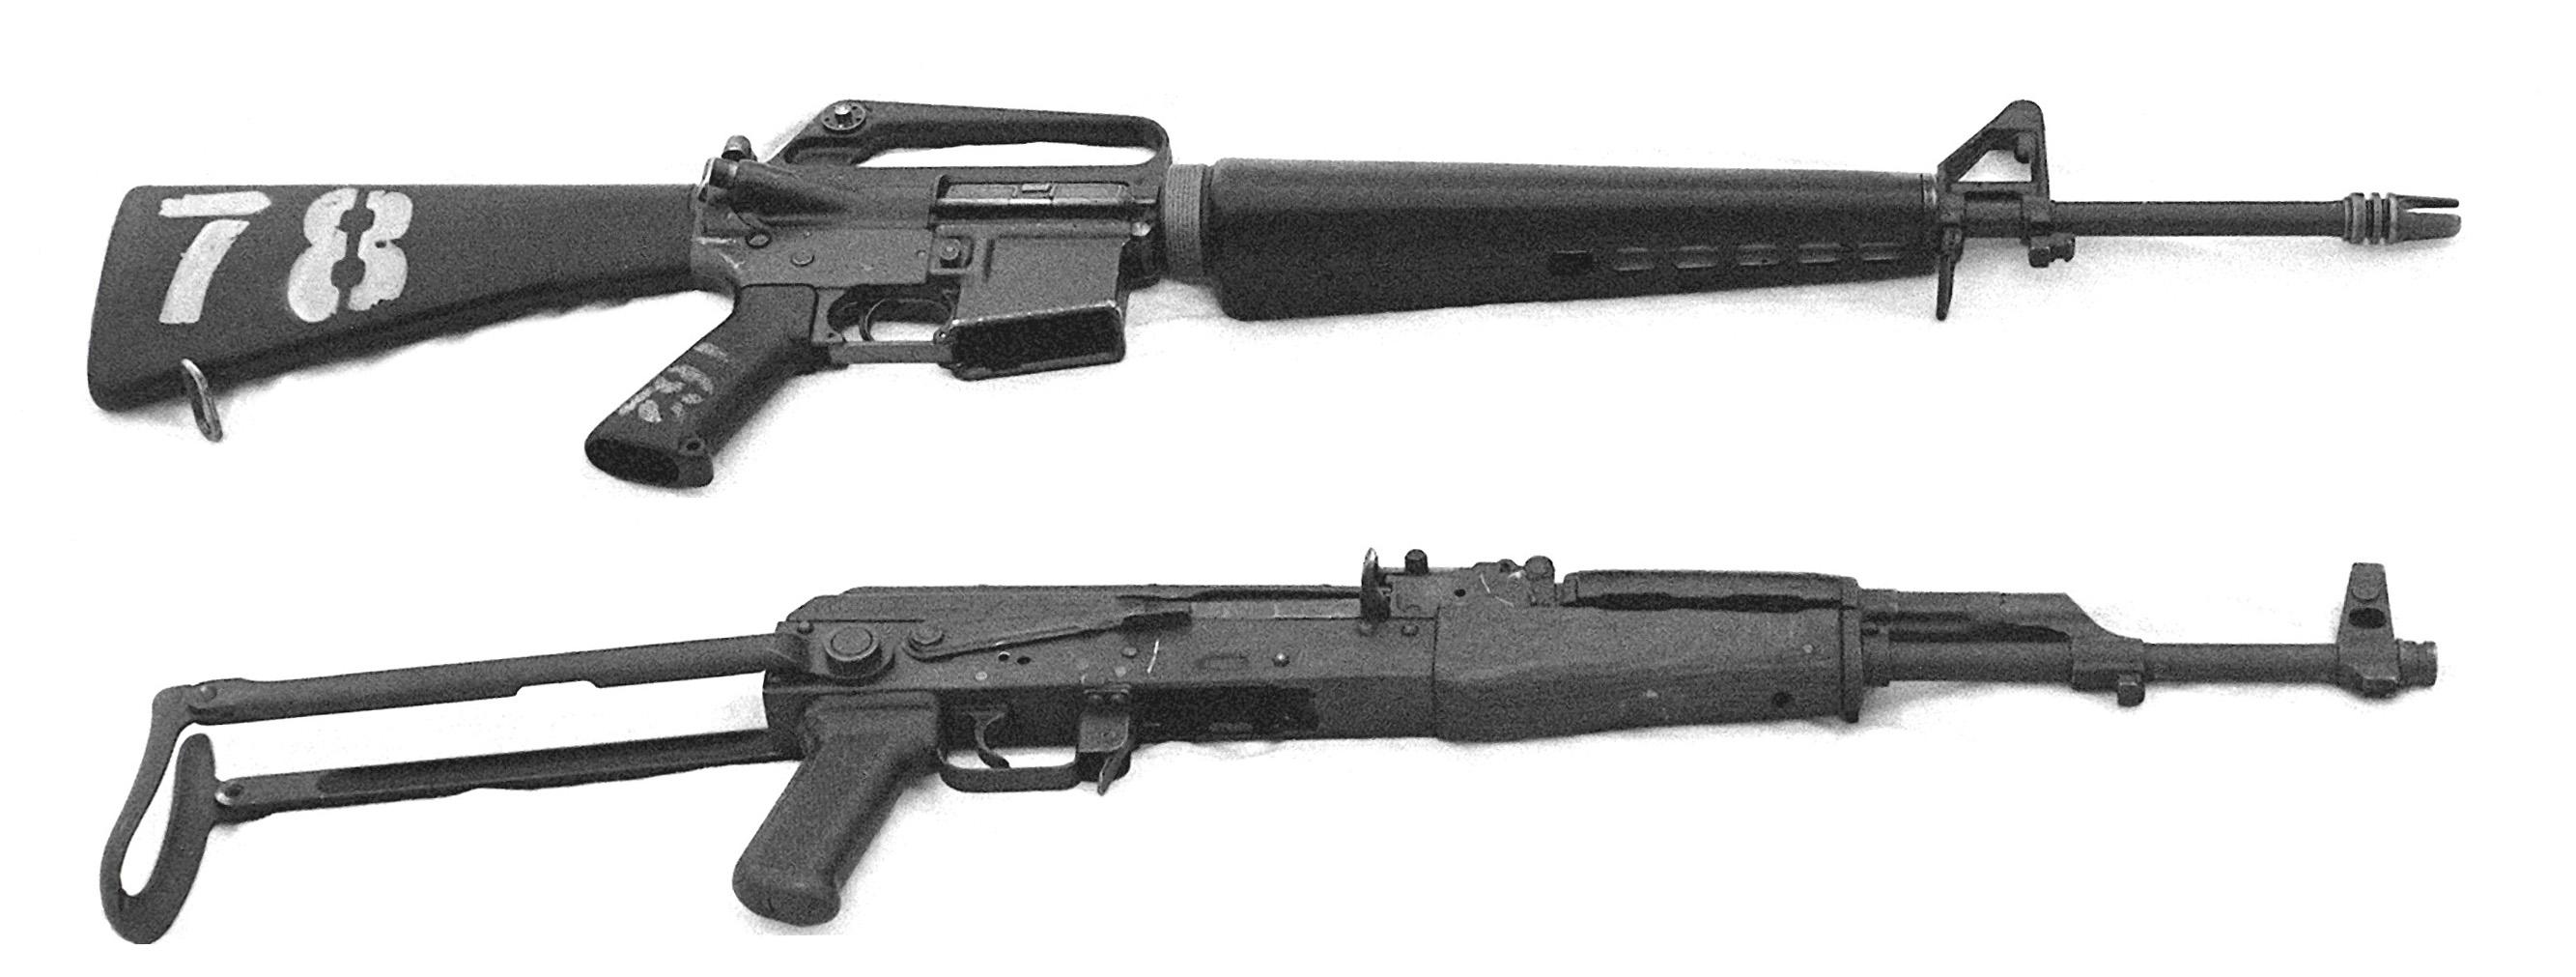 File:AKMS and M16 DM-SN-82-07698.jpg